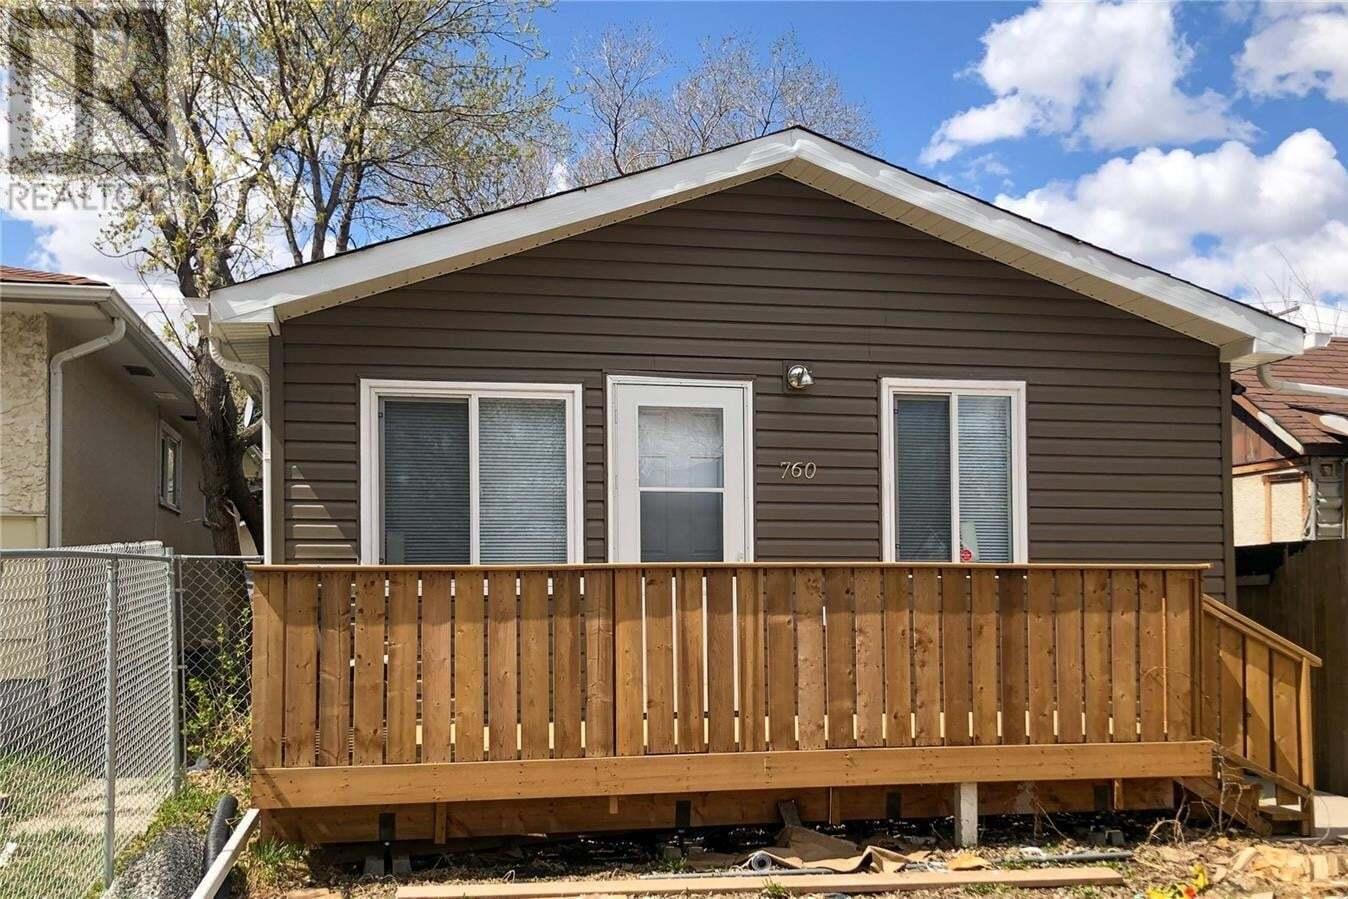 House for sale at 760 Rae St Regina Saskatchewan - MLS: SK830353